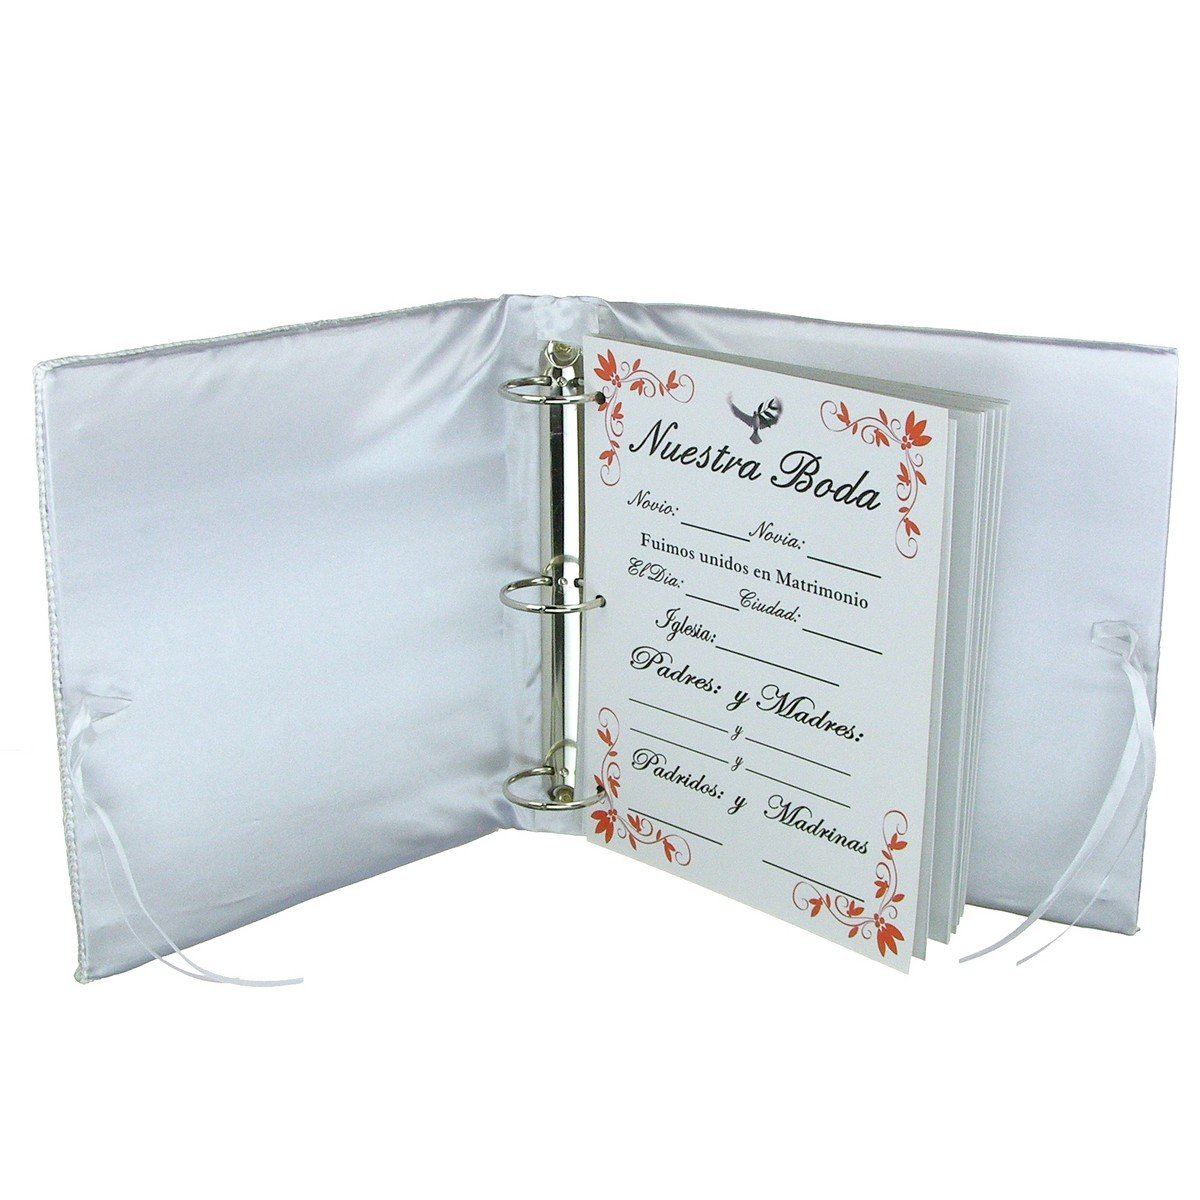 Amazon.com: Spanish Wedding Decorative Album - Silver Tone Metallic ...